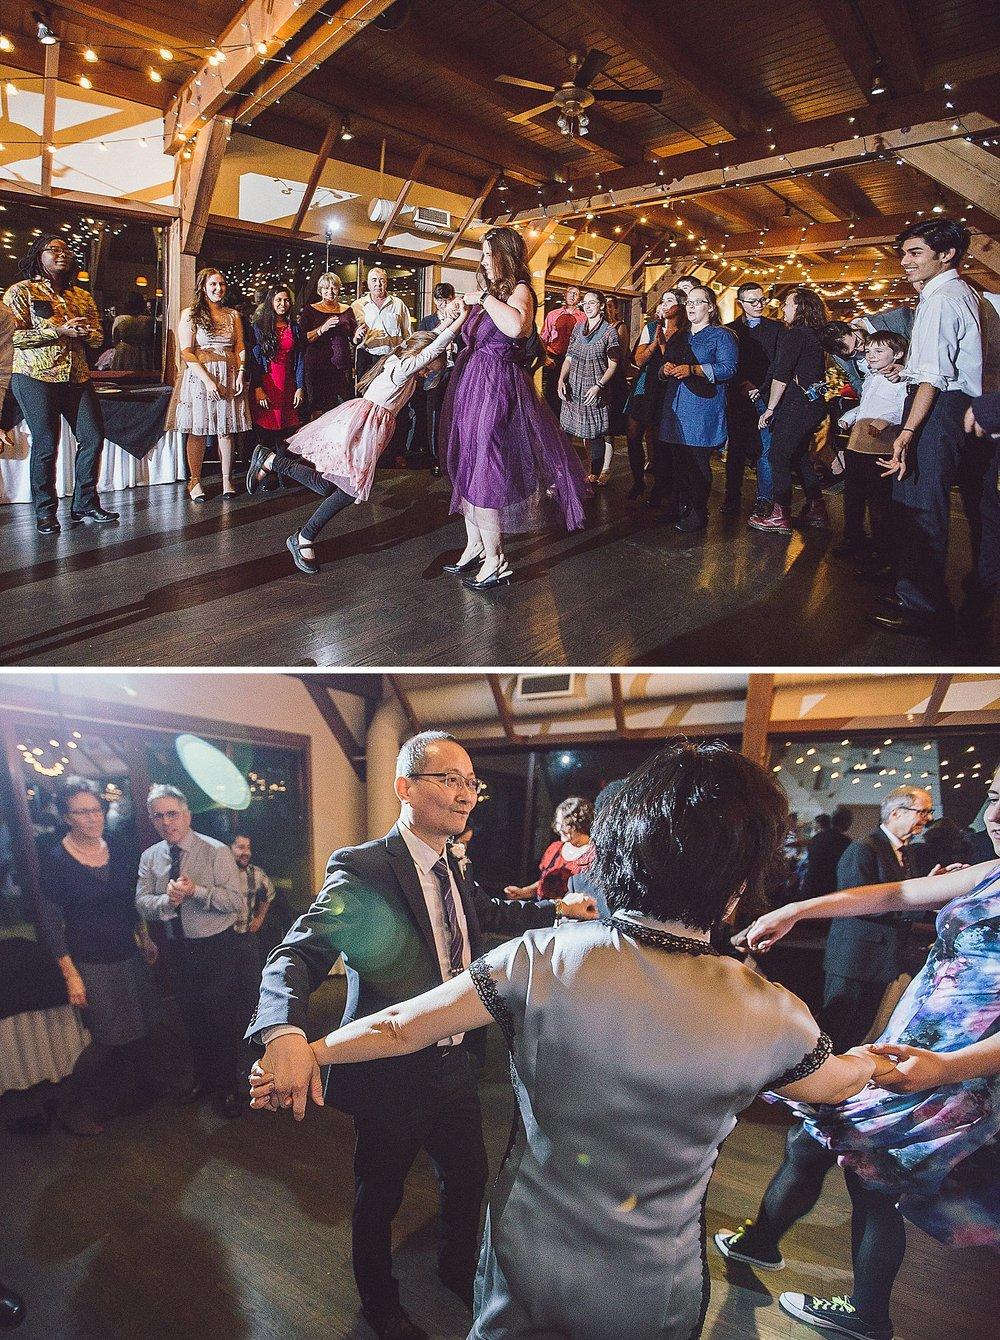 Dancing at the wedding reception